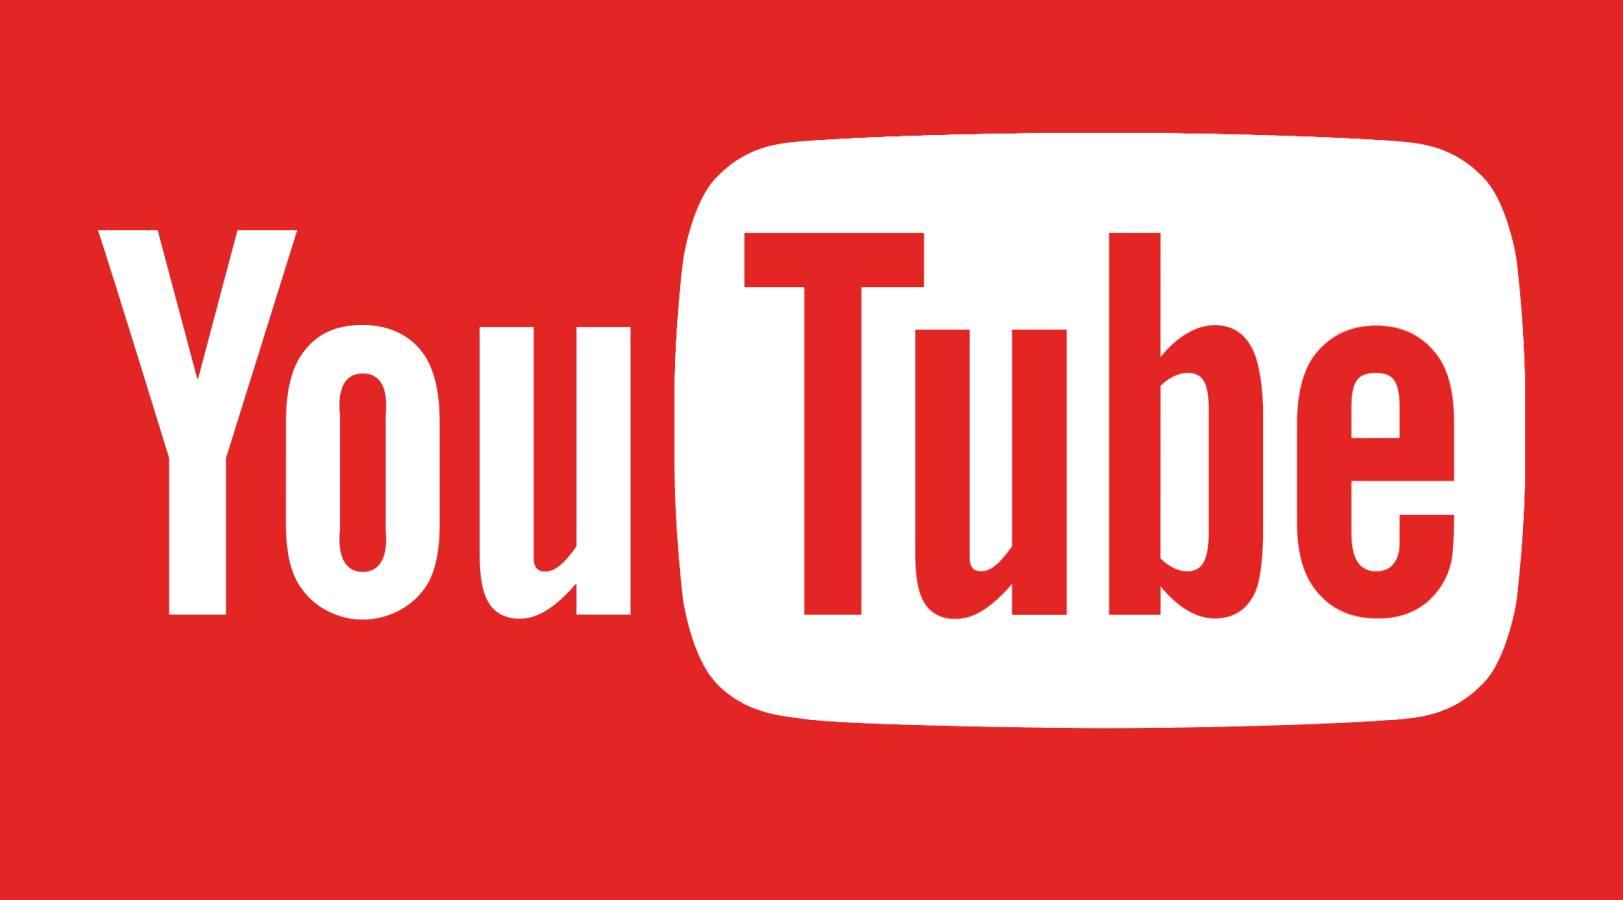 Youtube Actualizarea Noua Lansata Aplicatia Mobila